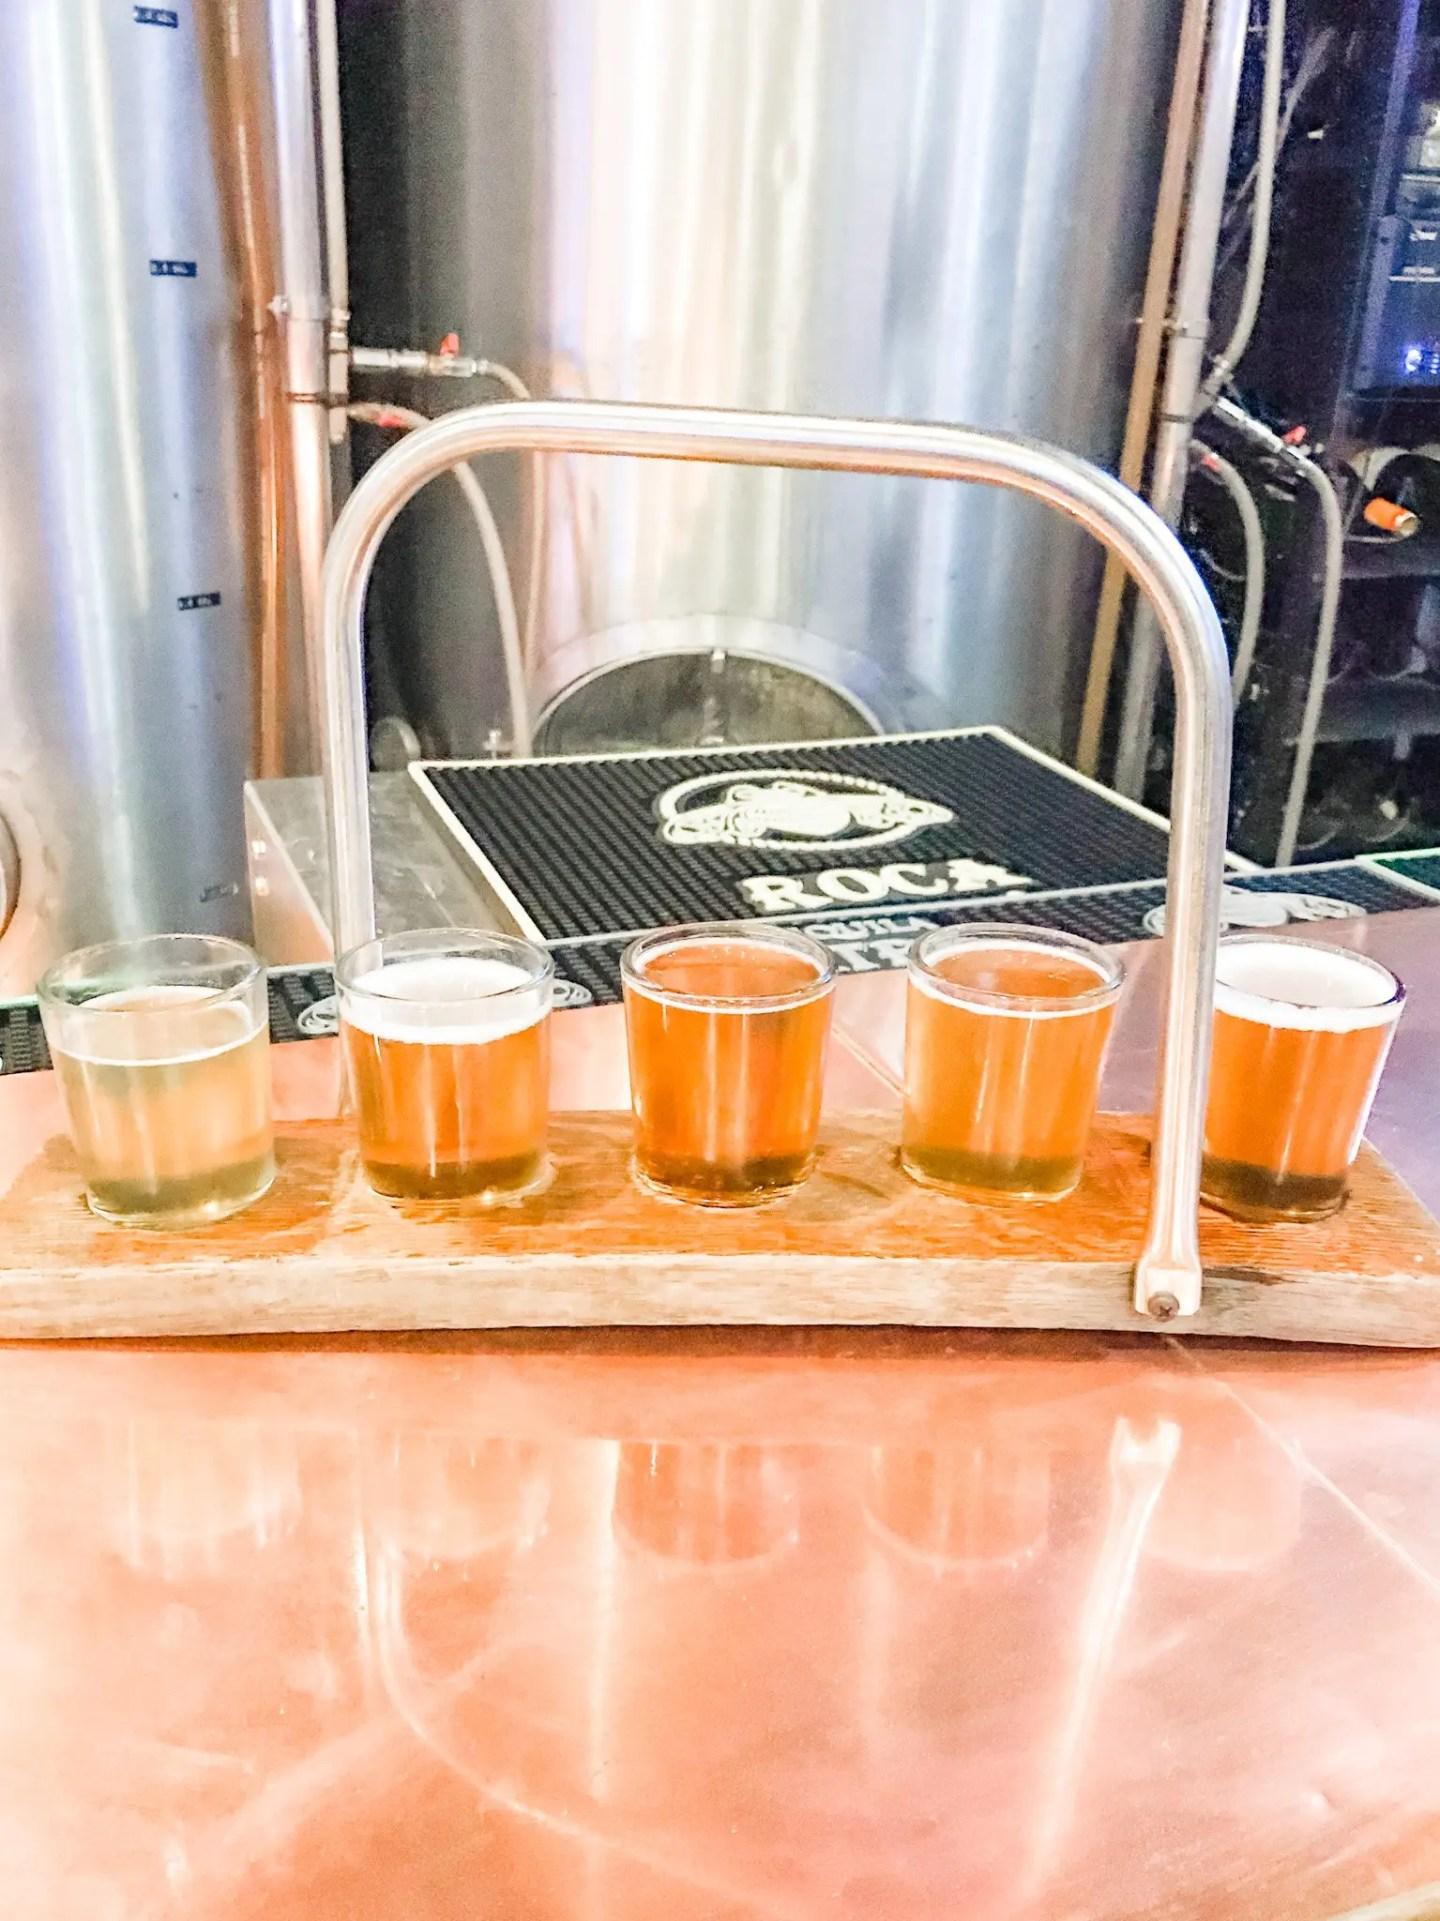 Beer flight at Santa Barbara Brewing Company (no longer in business).